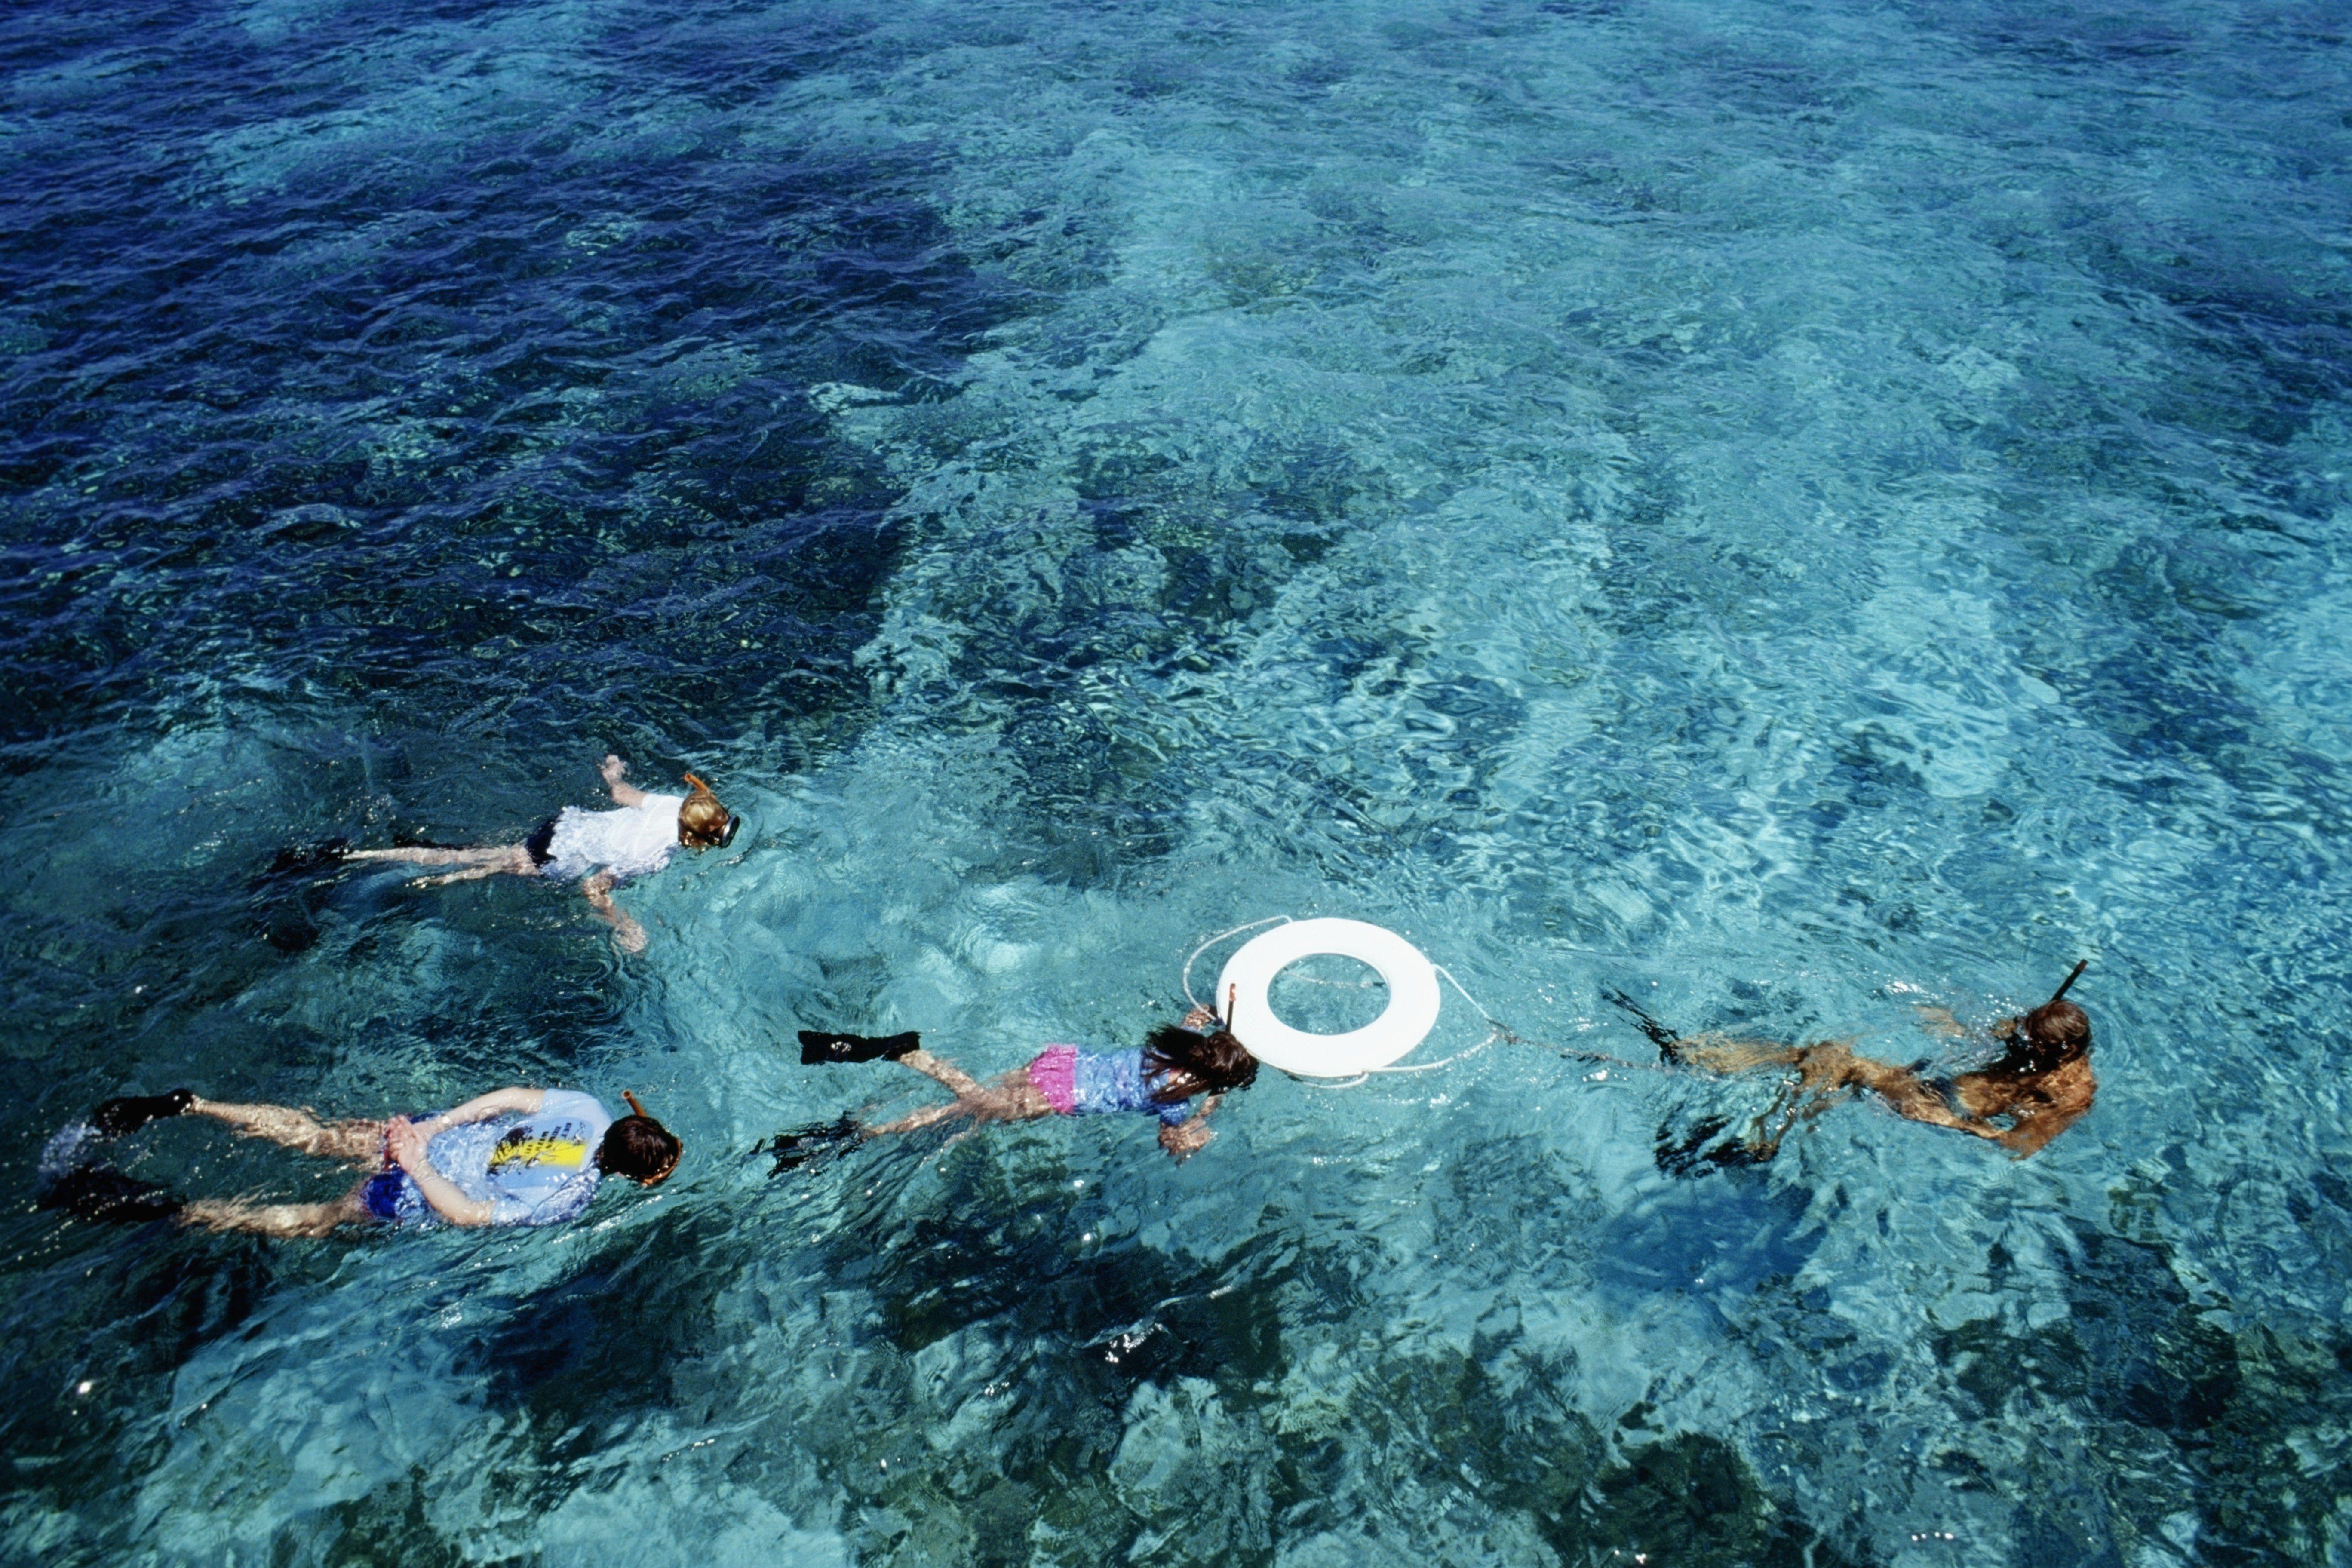 Four people snorkeling, St. Croix, Virgin Islands